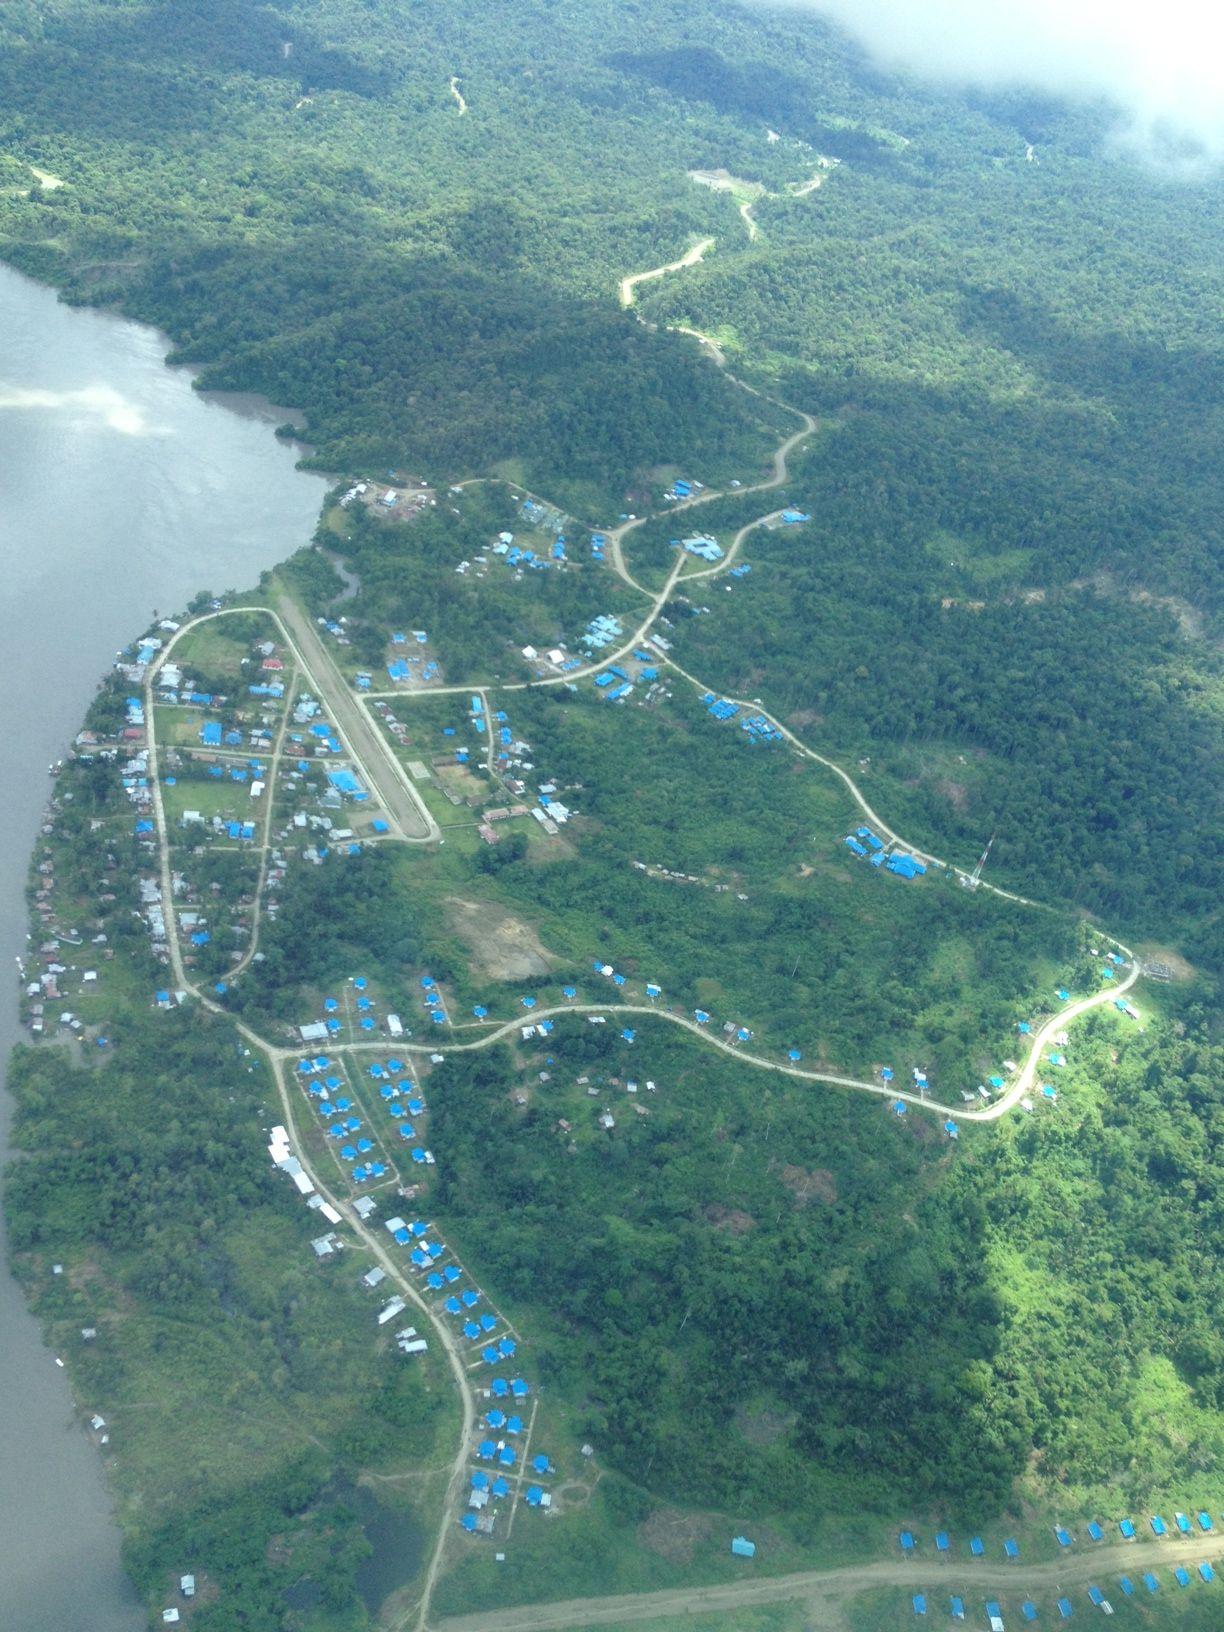 My City Kasonaweja